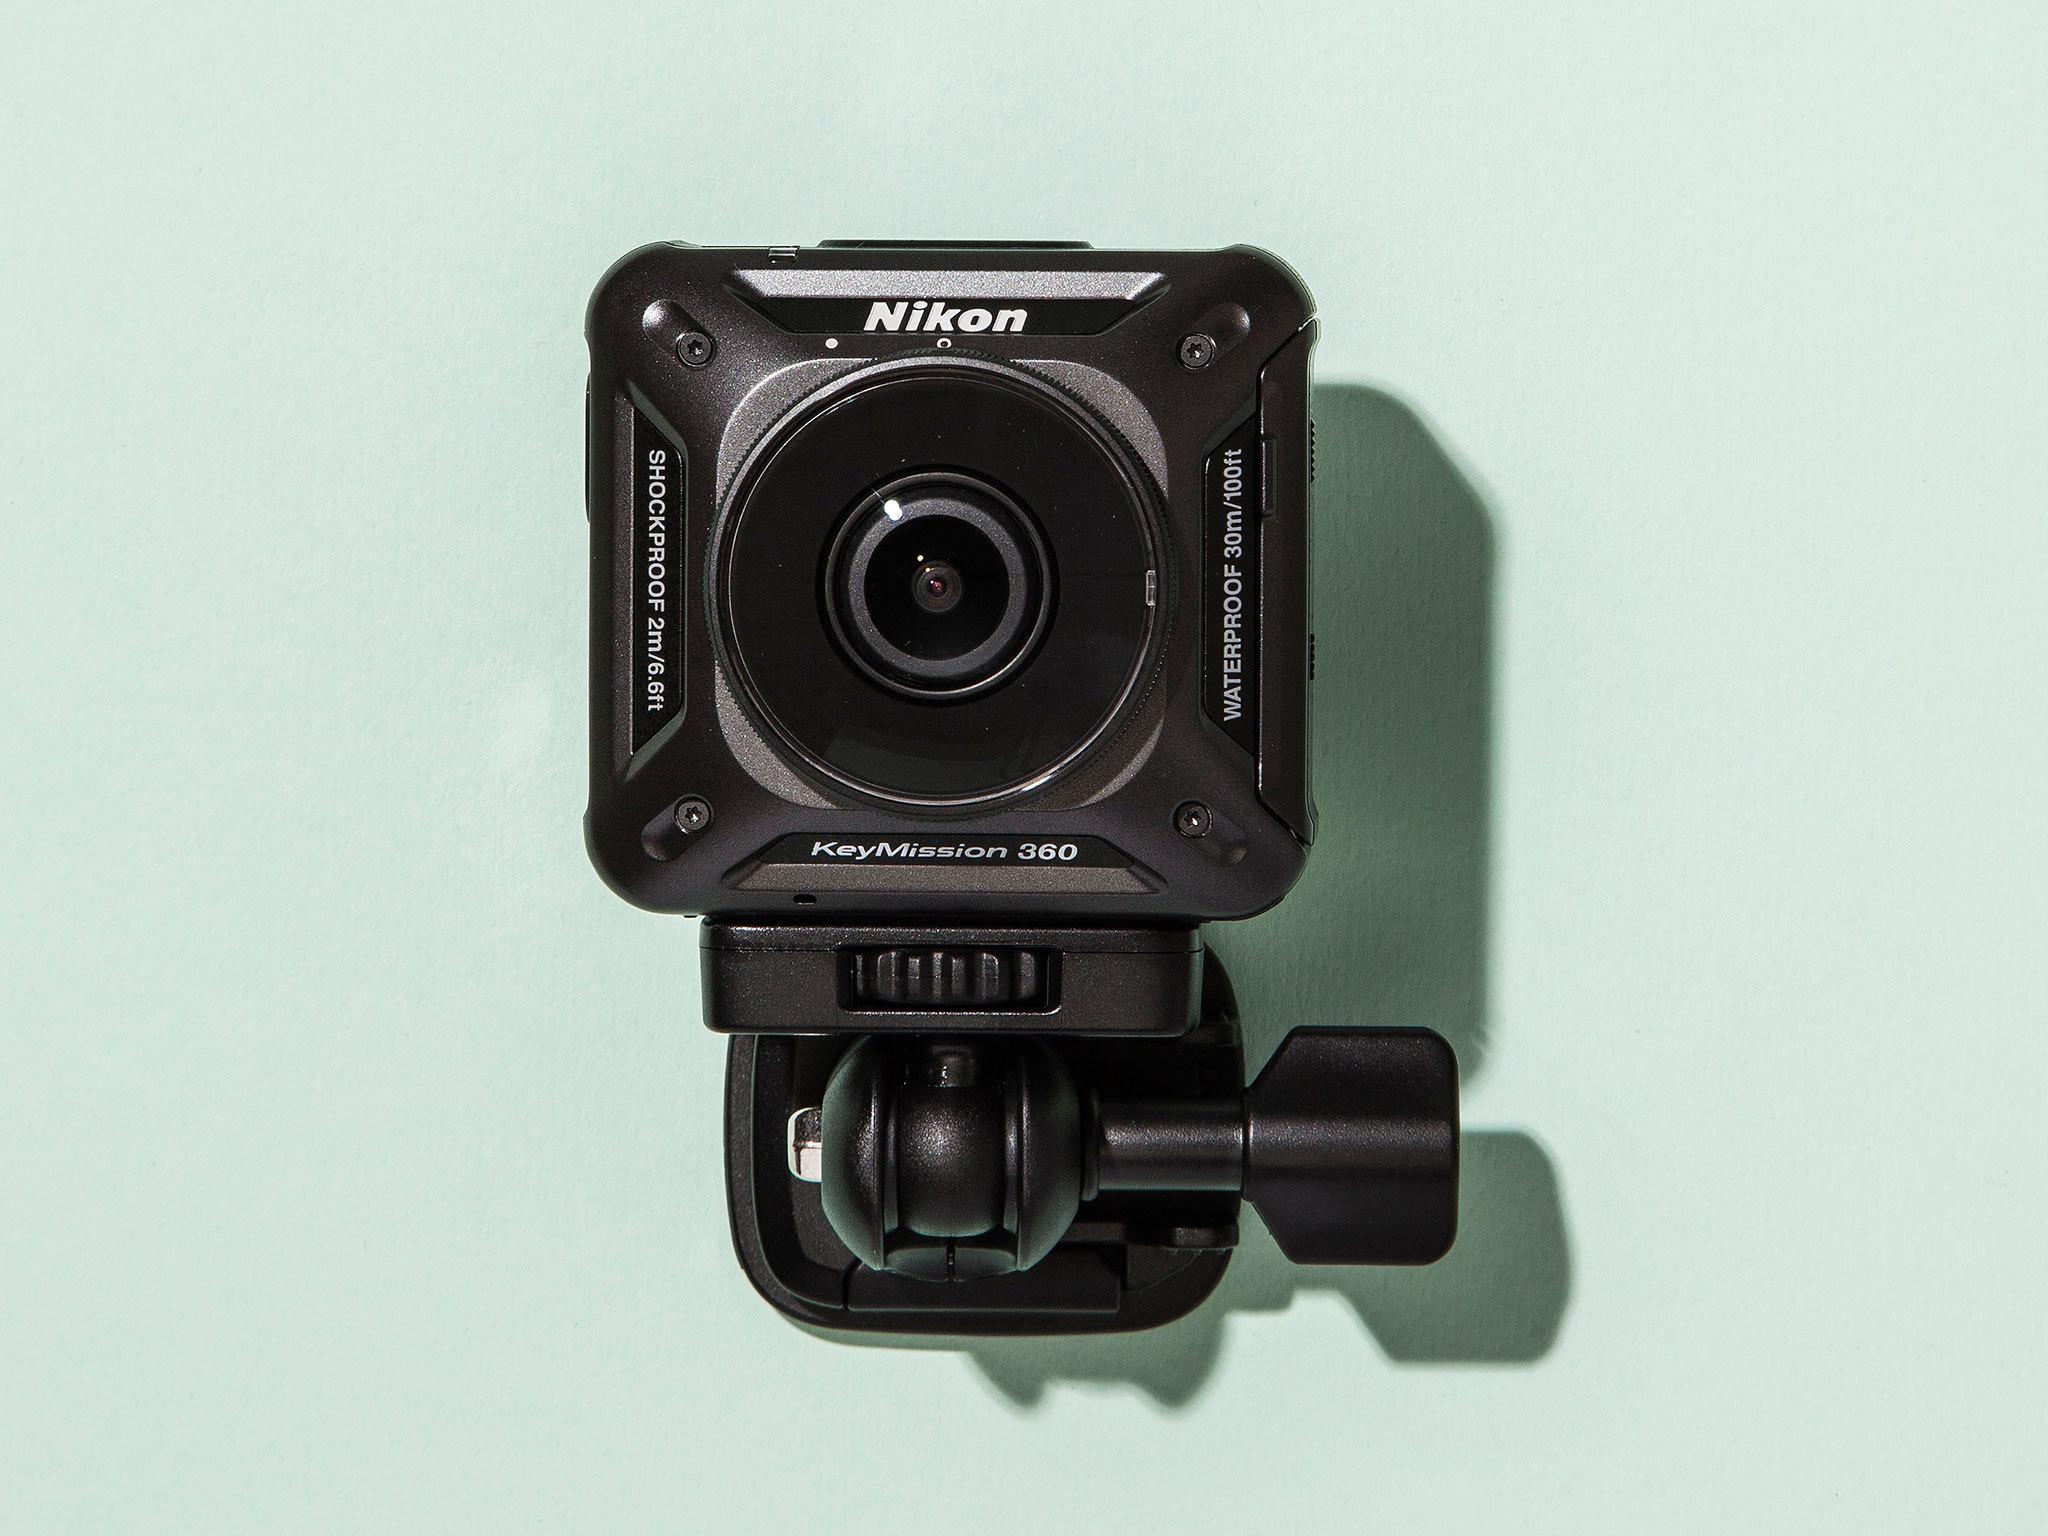 Nikon KeyMission 360 camcorder